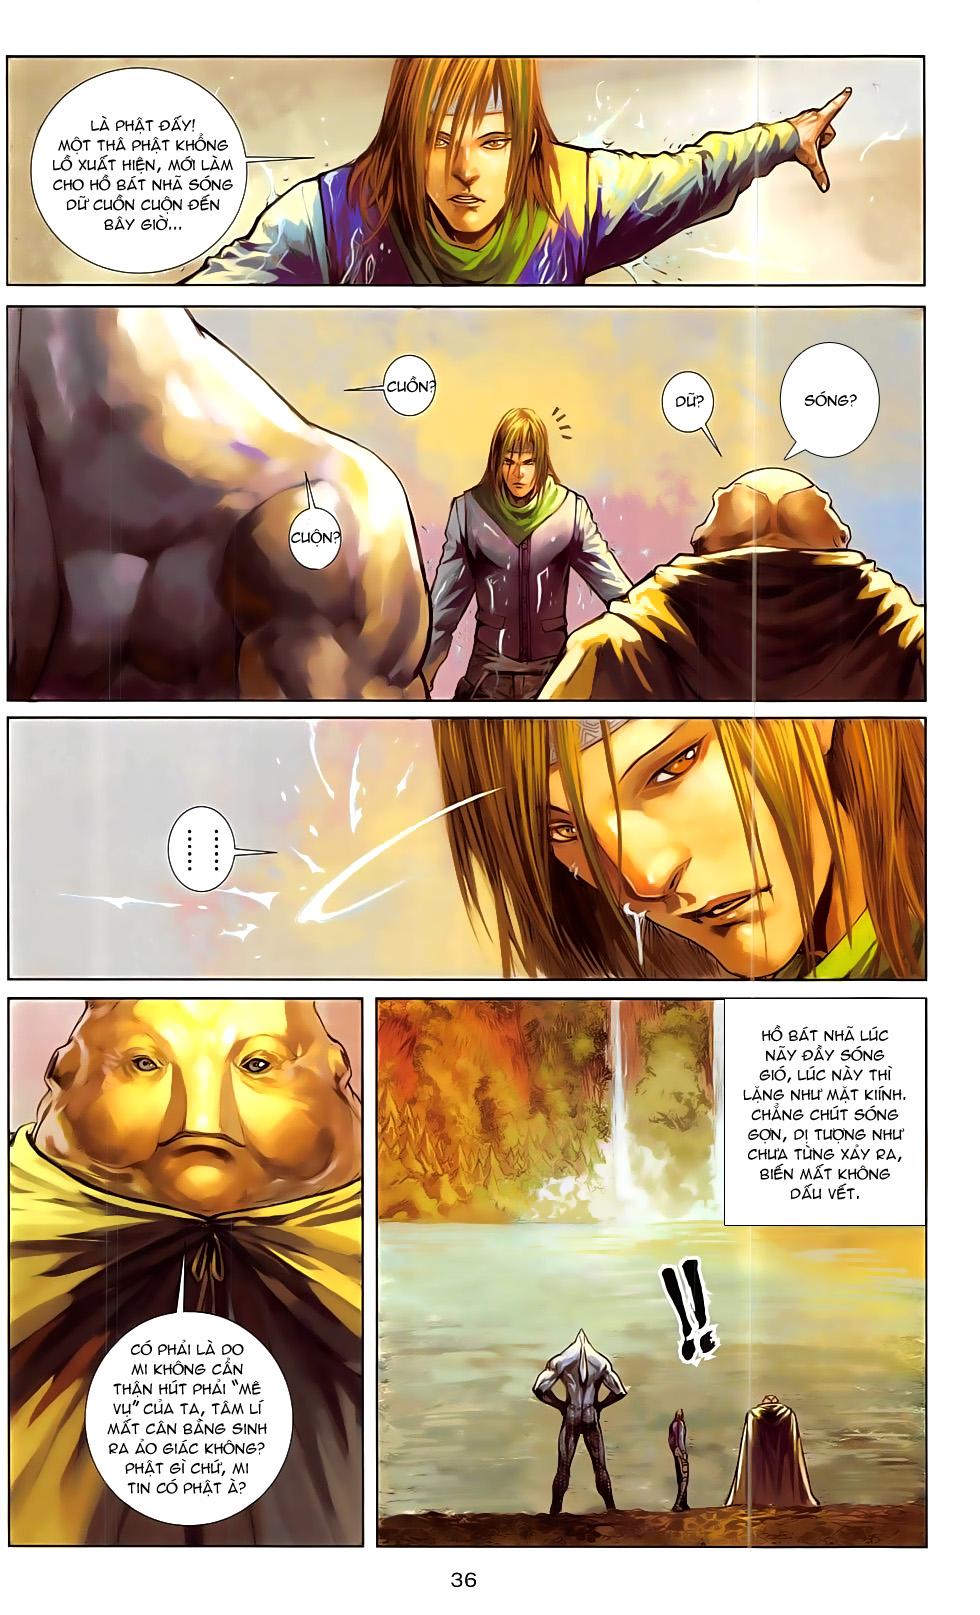 Thần Binh Đấu Giả Chap 2.2 - Next Chap 3